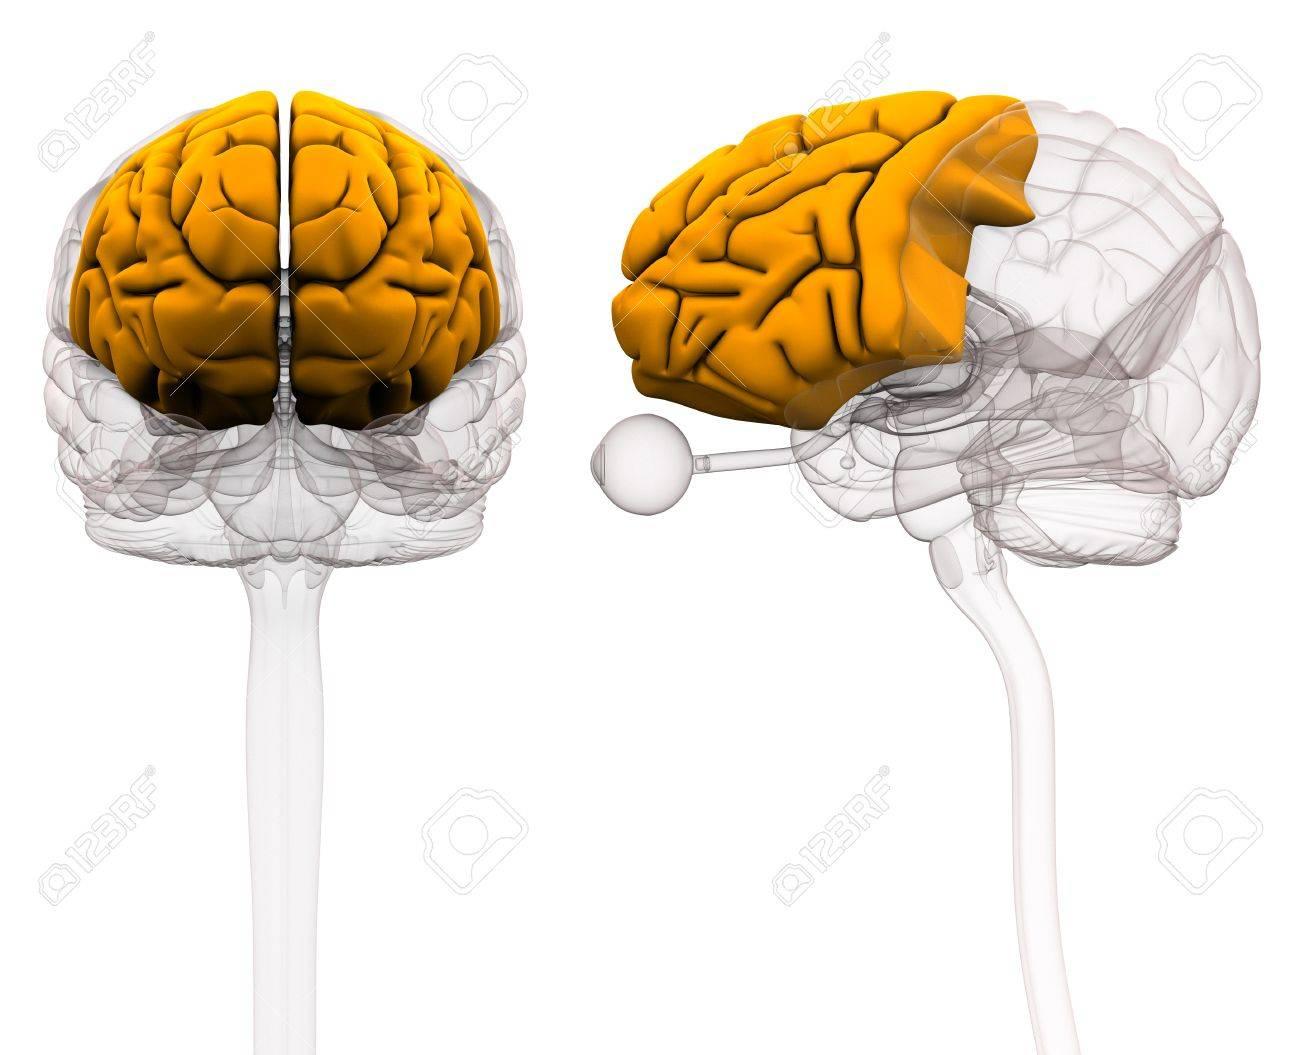 Frontal Lobe Brain Anatomy - 3d Illustration Stock Photo, Picture ...